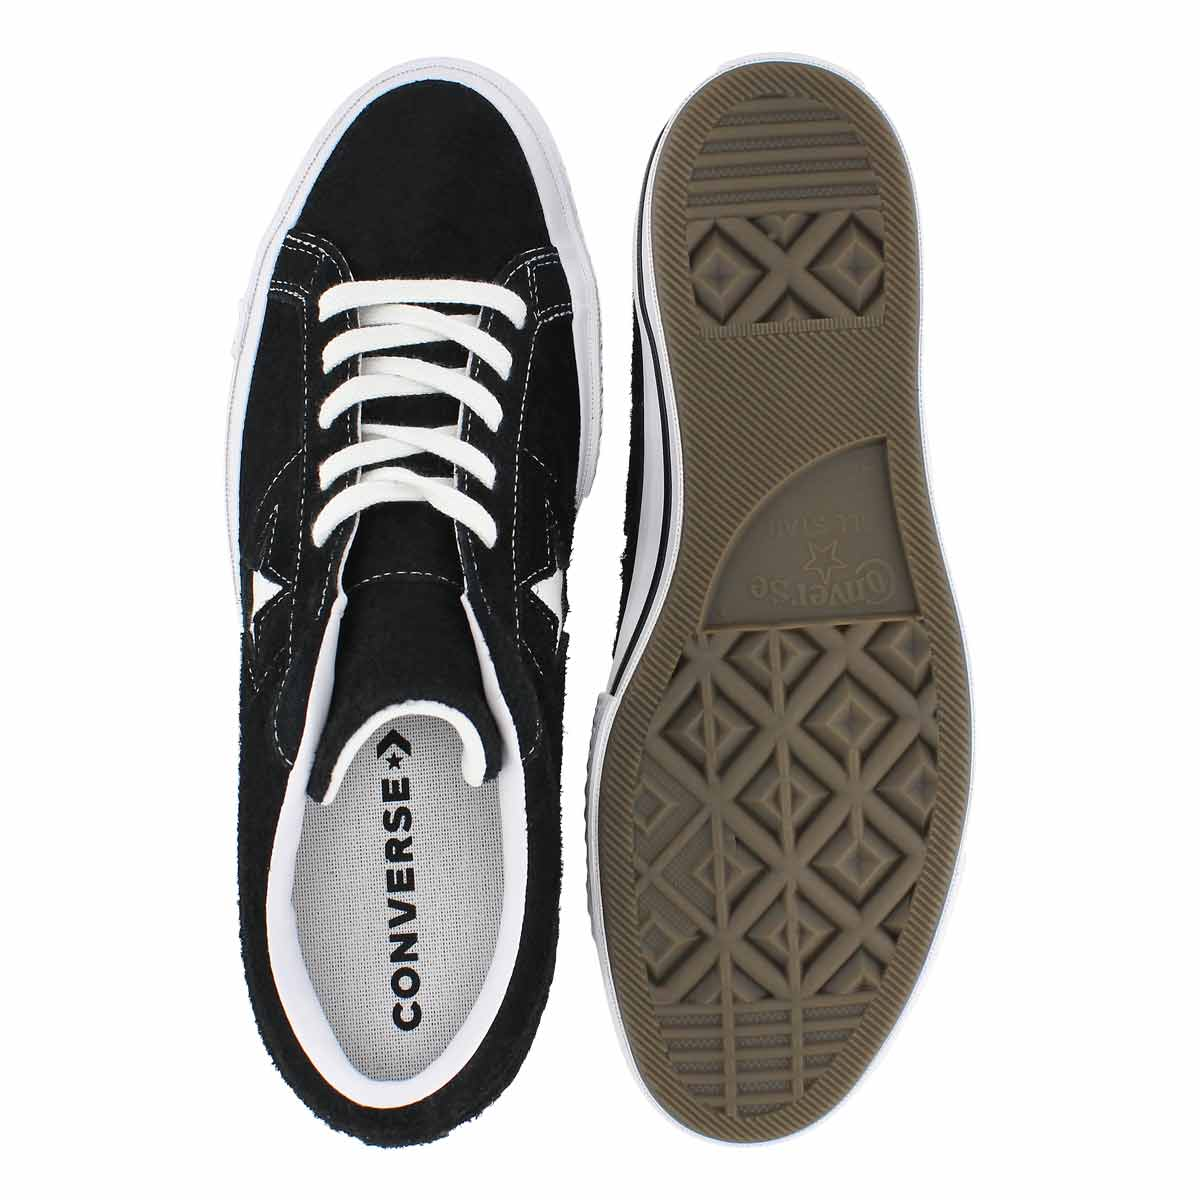 Mns One Star black fashion sneaker